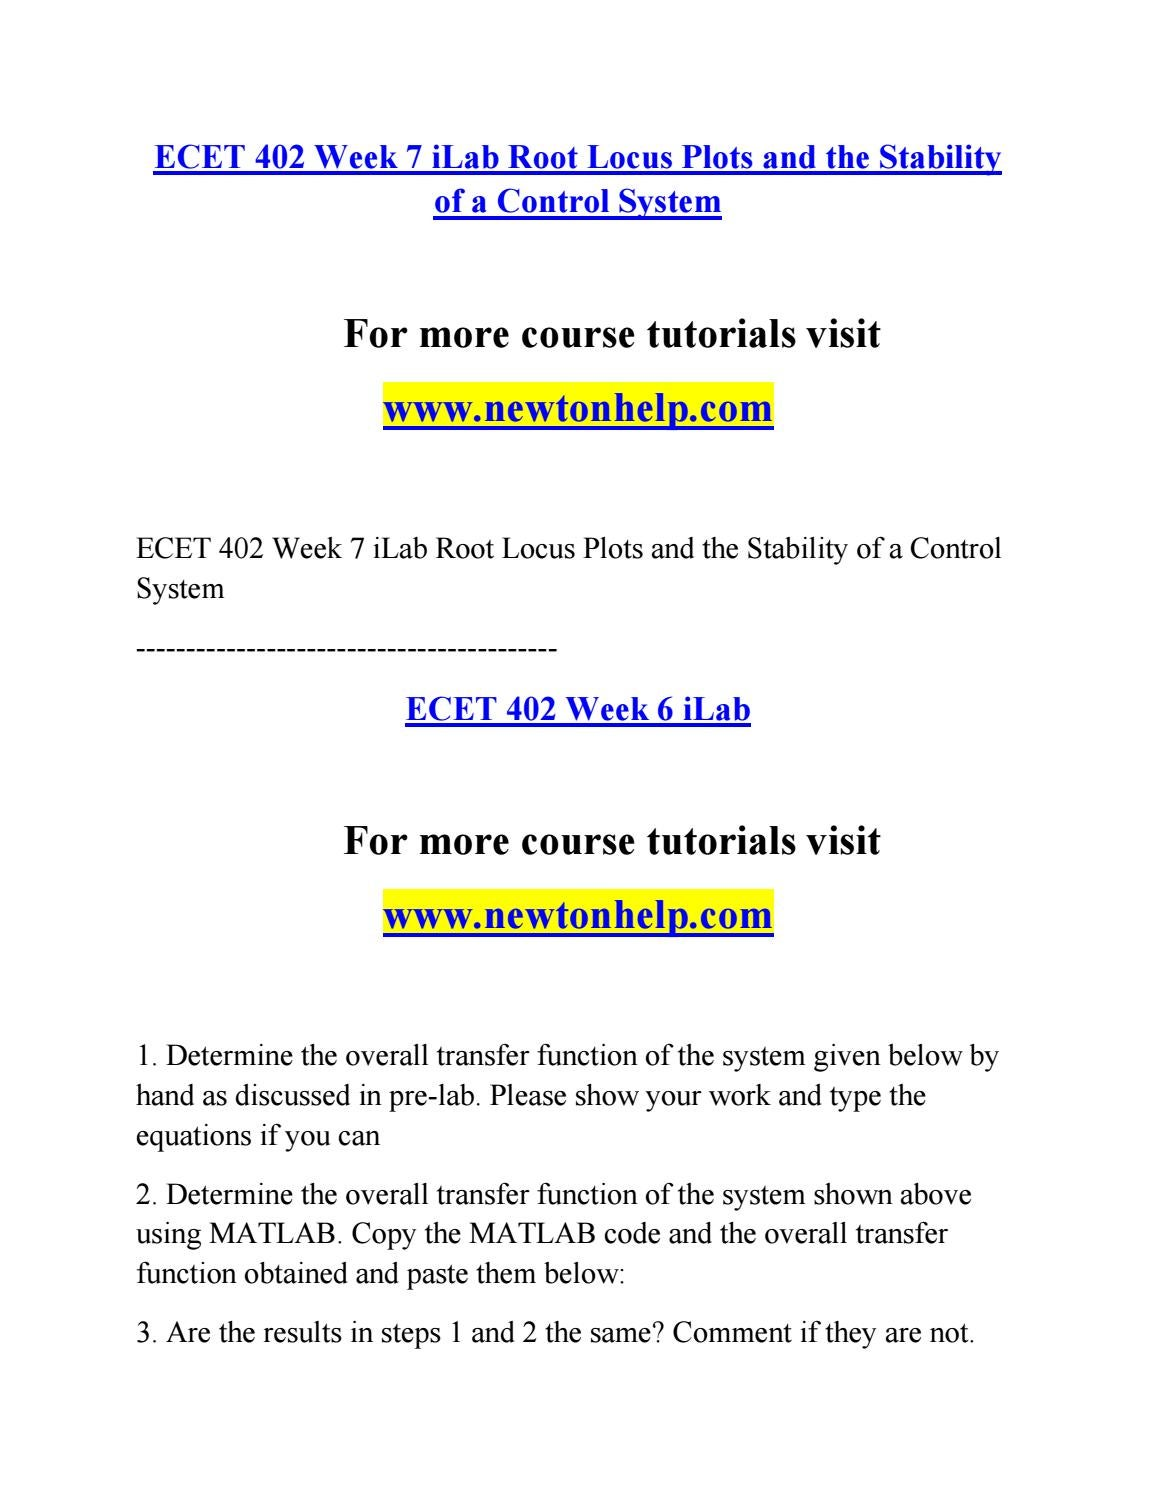 ECET 402 Inspiring Minds/newtonhelp com by dend robiumorchids567 - issuu